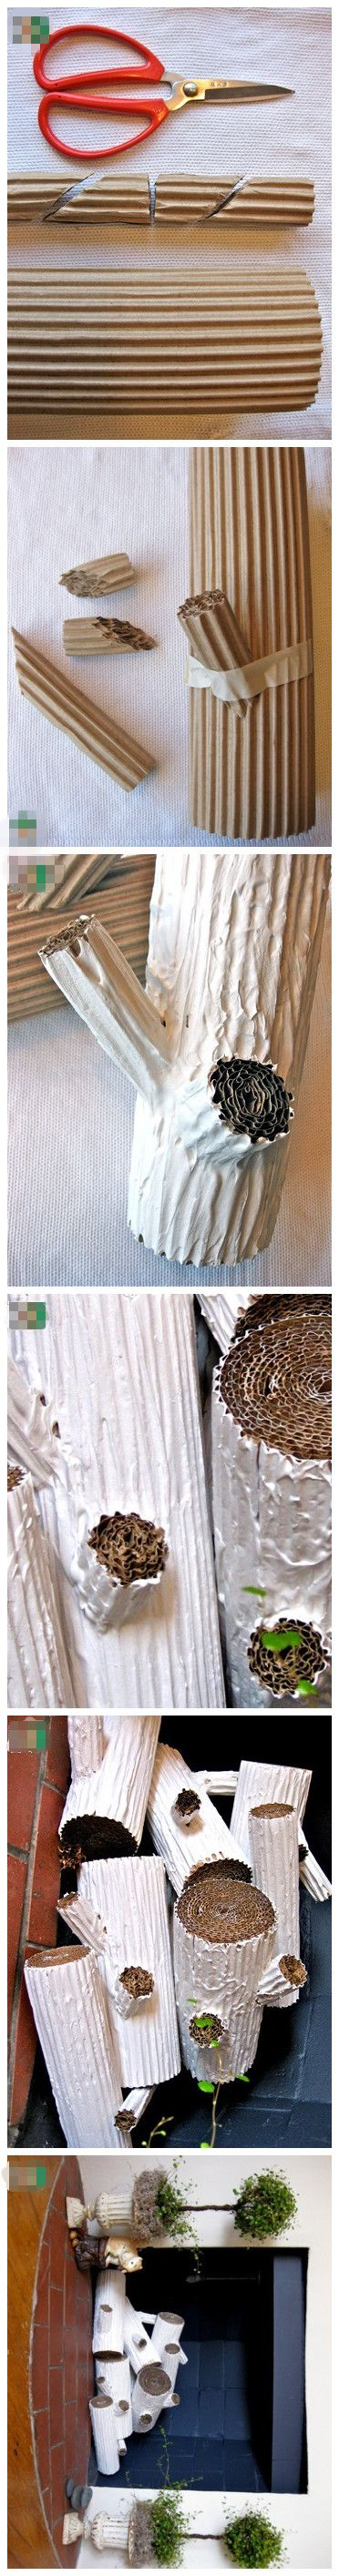 corrugated cardboard logs